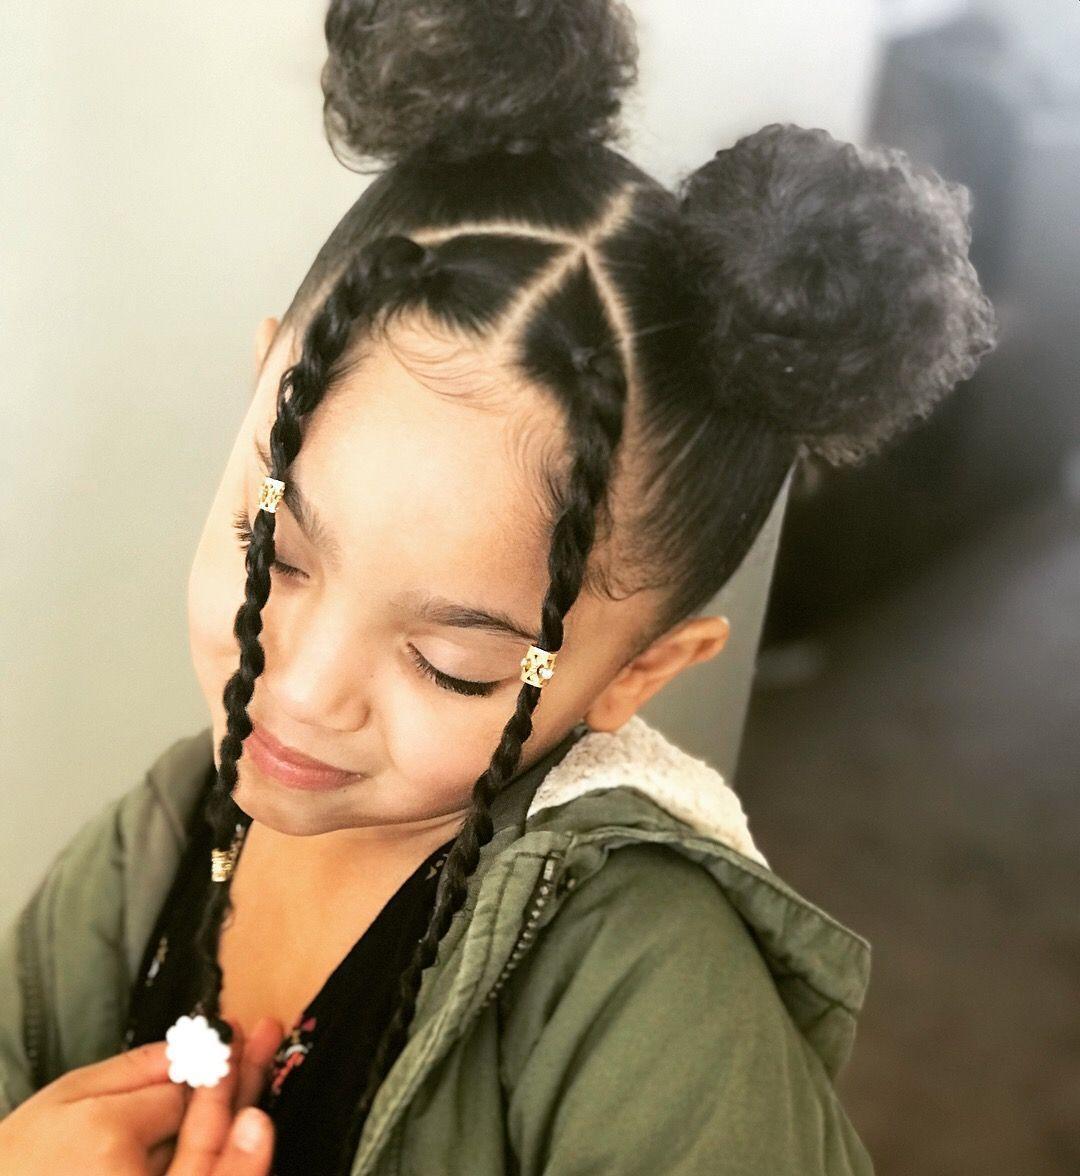 Naturalhairstyles Girlshairstylesforschool In 2020 Black Girl Natural Hair Kids Curly Hairstyles Natural Hair Styles